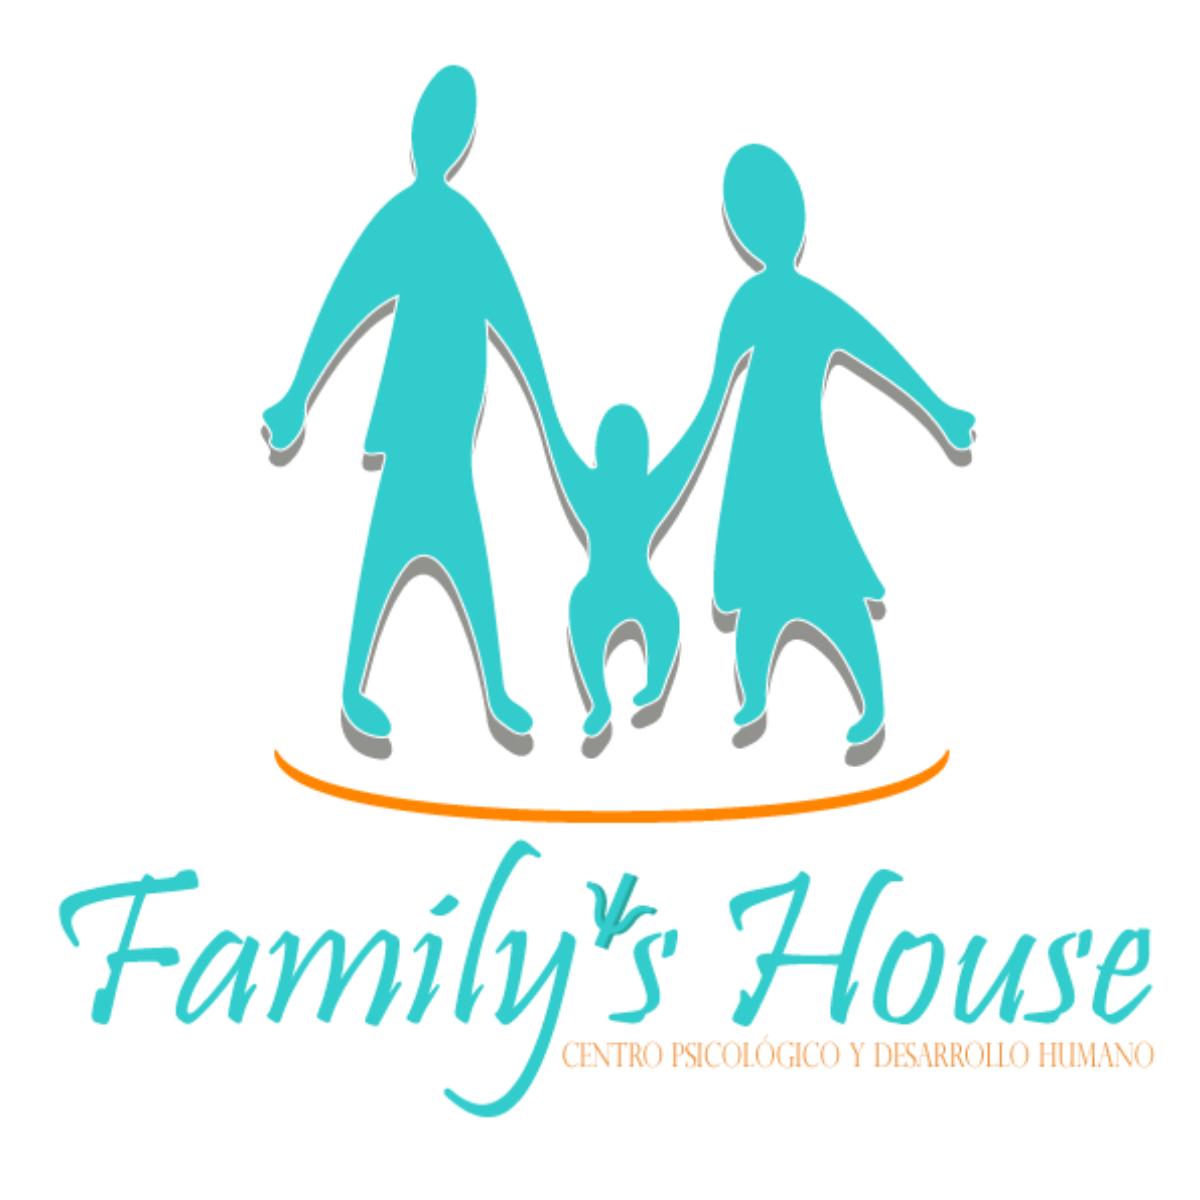 FAMILY'S HOUSE